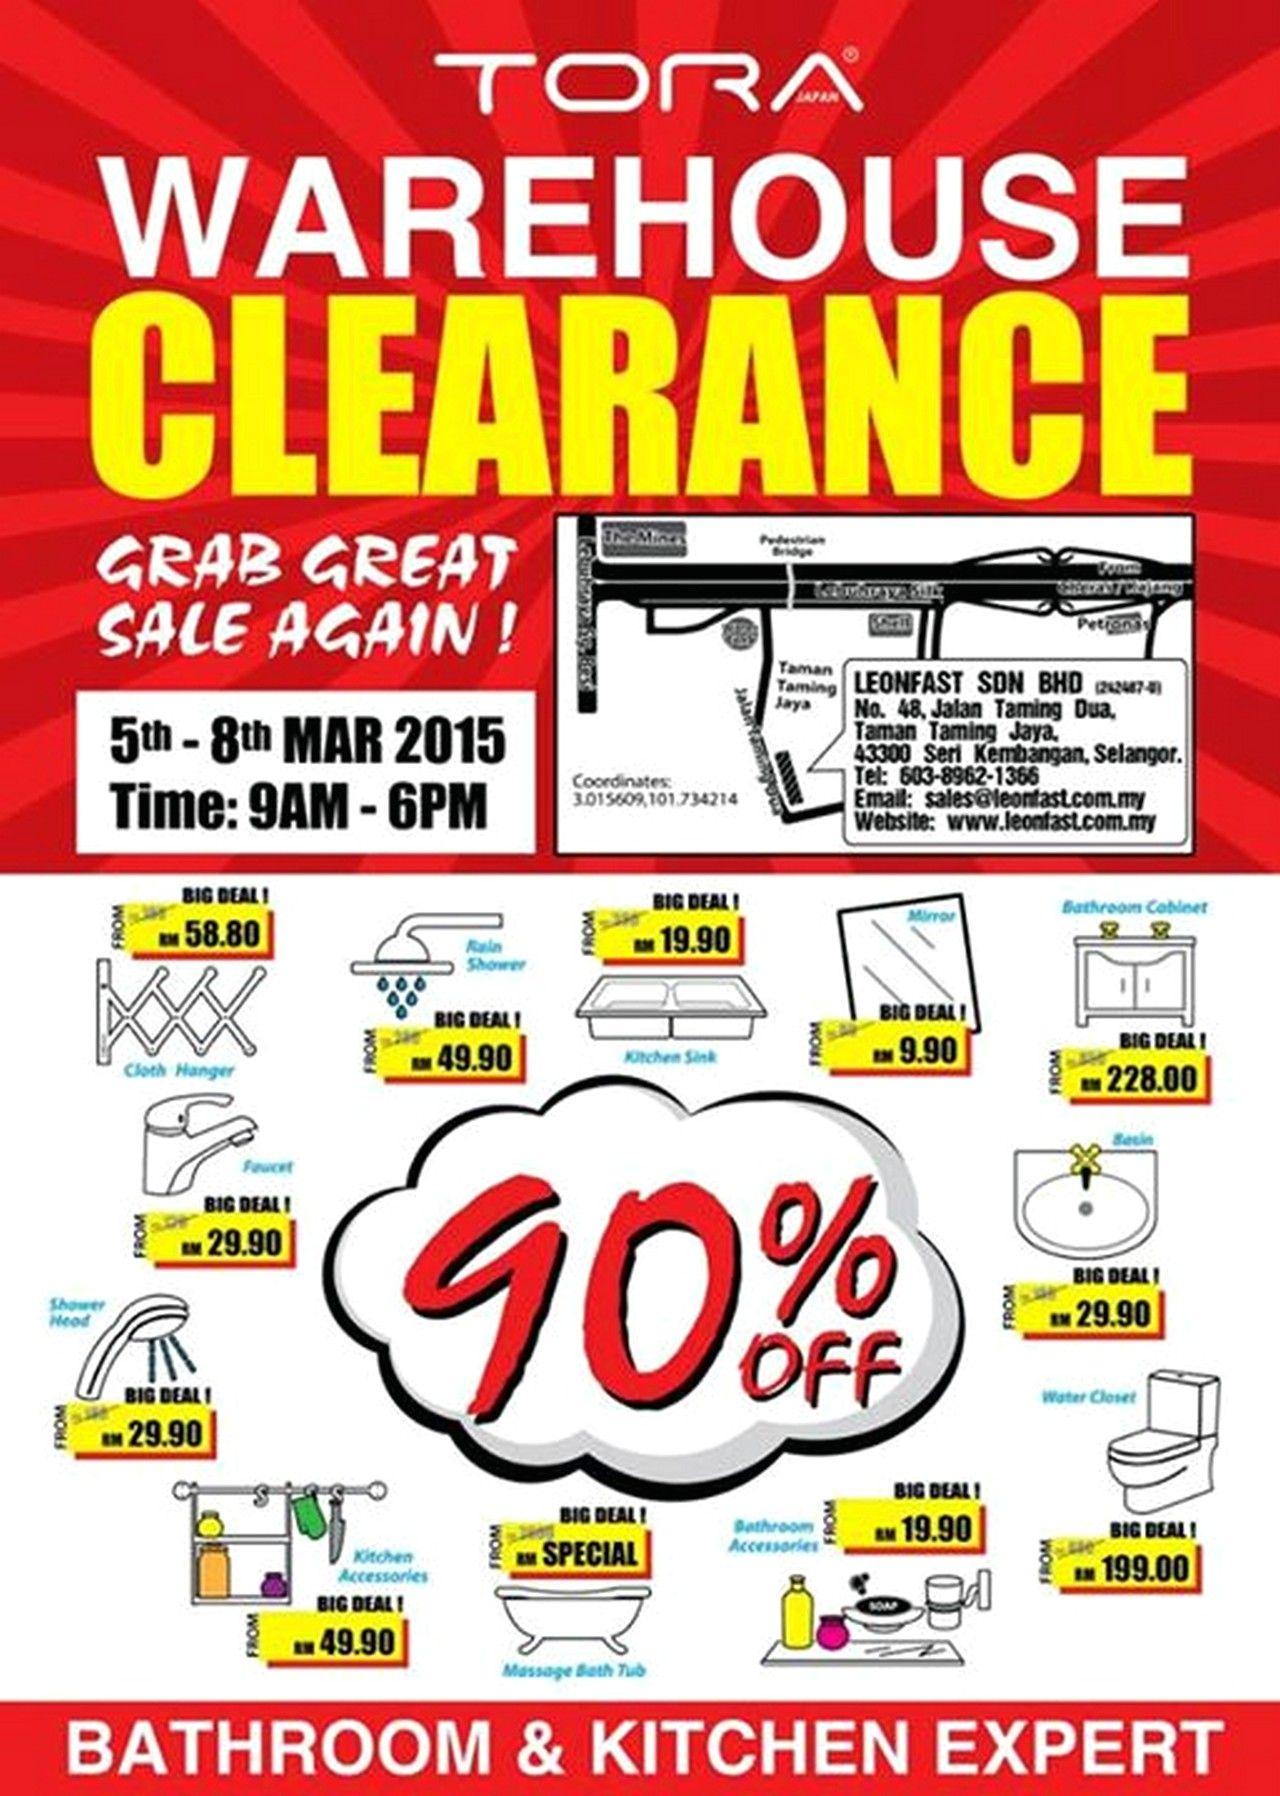 Bathroom Kitchen Clearance Warehouse Sale In Malaysia Warehouse Sales Warehouse Sale